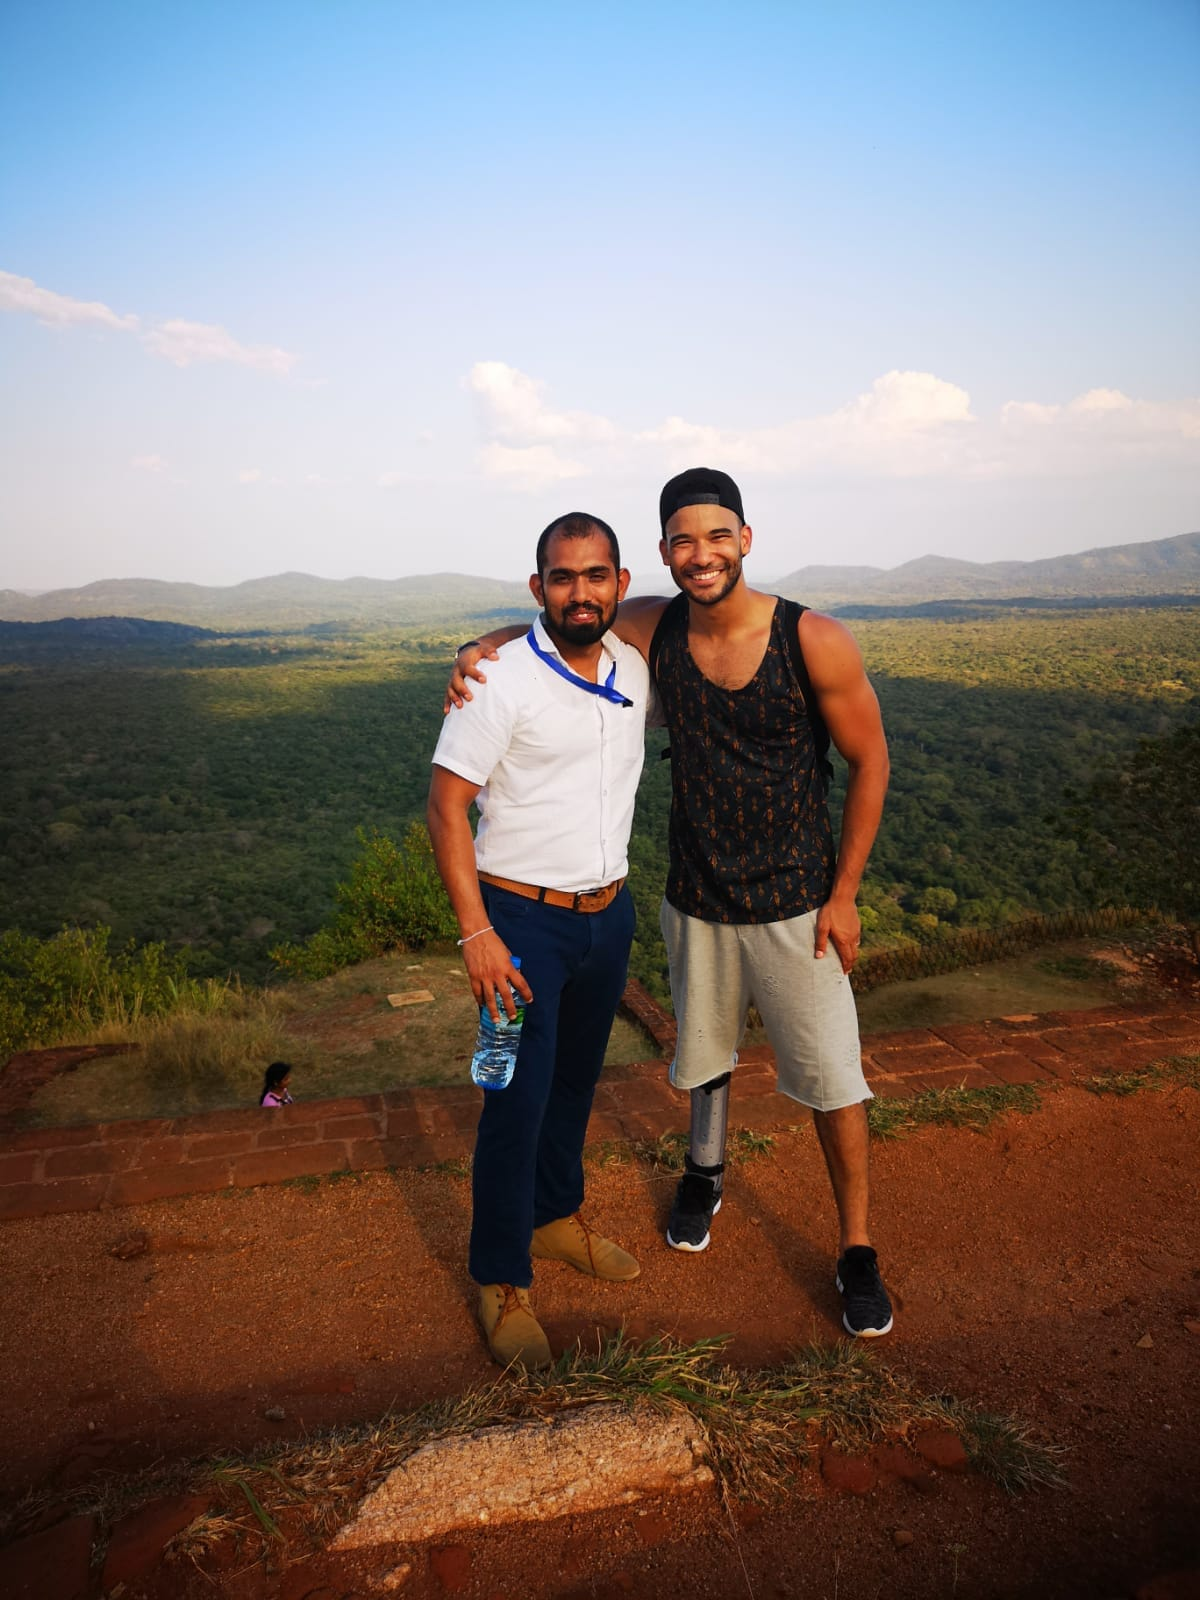 invite-to-paradise-sri-lanka-holiday-honeymoon-specialists-customer-feedback-elin-jordan-luce-chauffeur-guide-ruchira-1.JPG